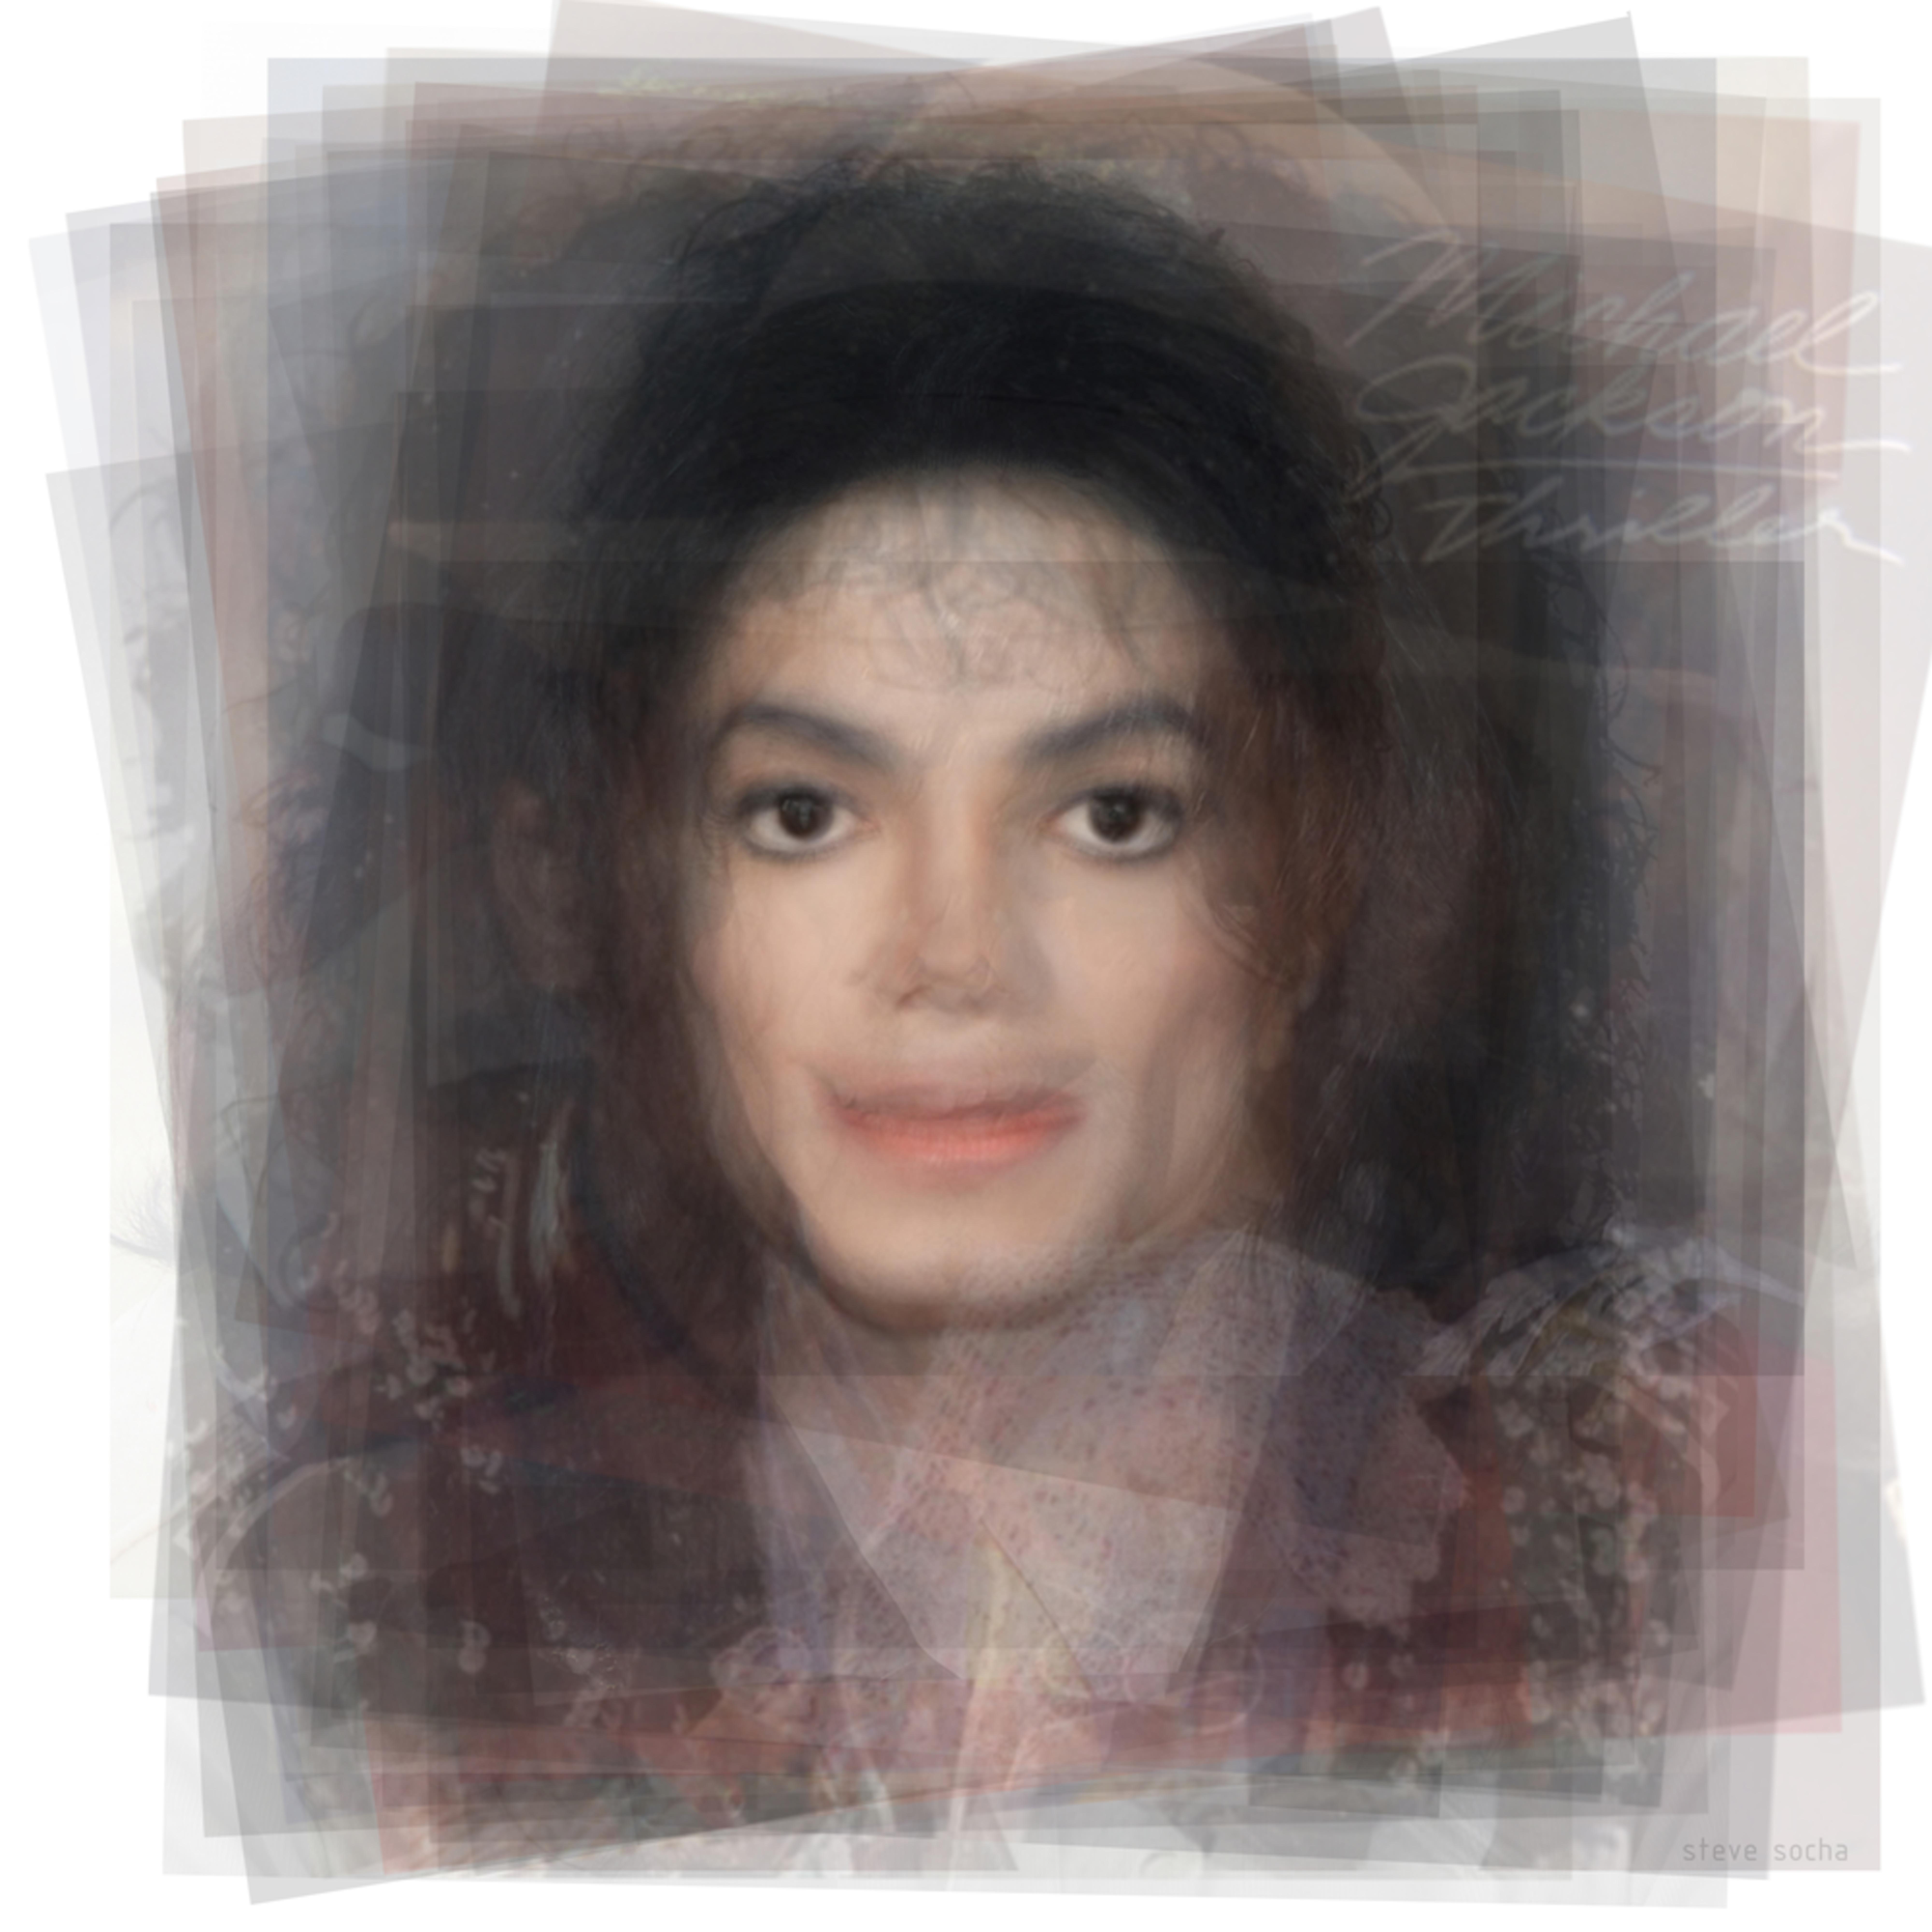 Michael jackson vqehxd